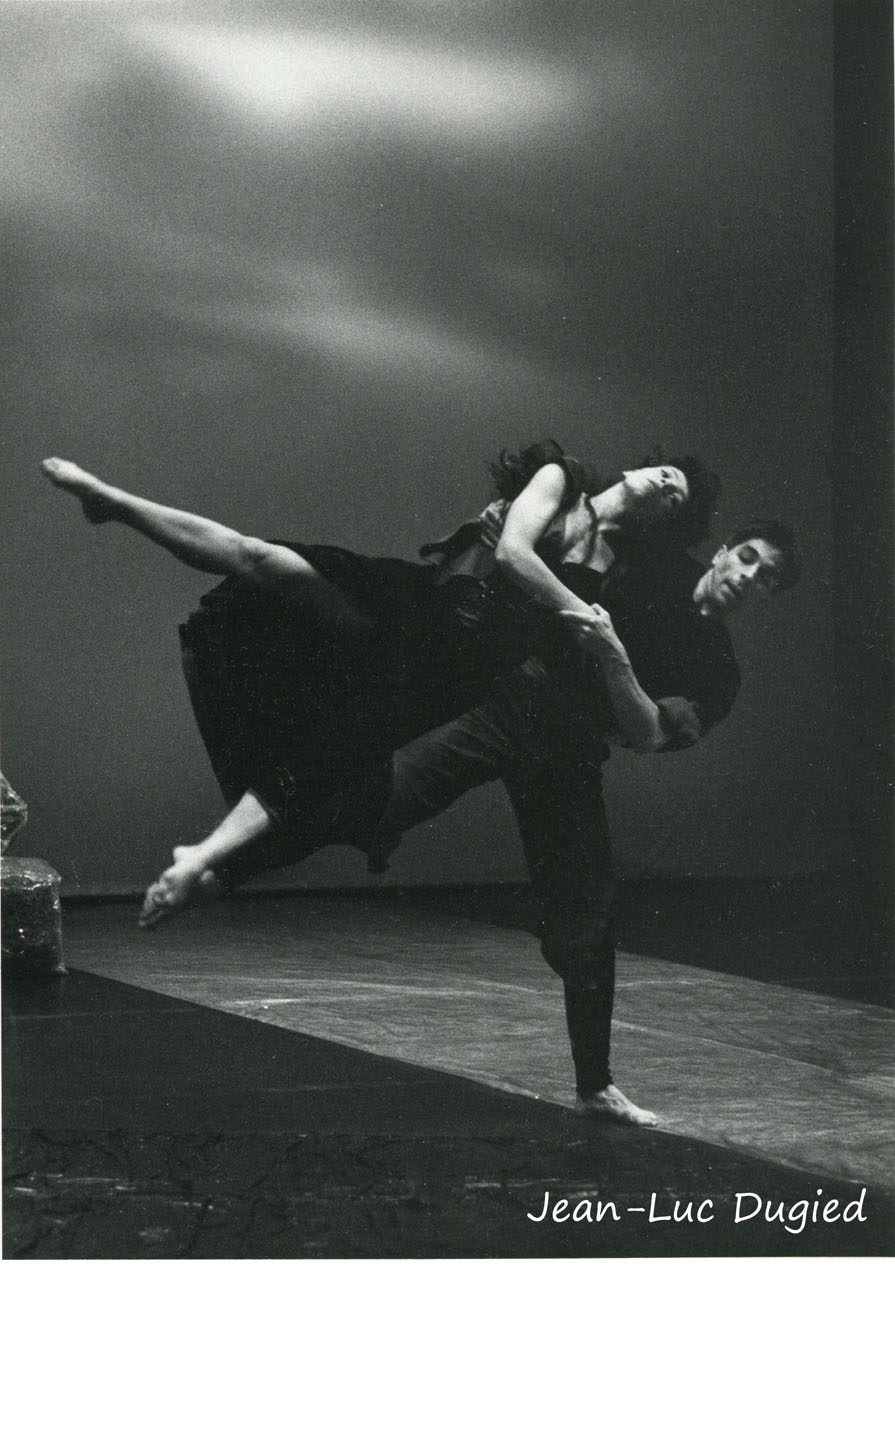 30 Bleton Jean-Christophe - la croisade des fous - Sylvie Saidmann et Jean- Christophe Bleton - 1988